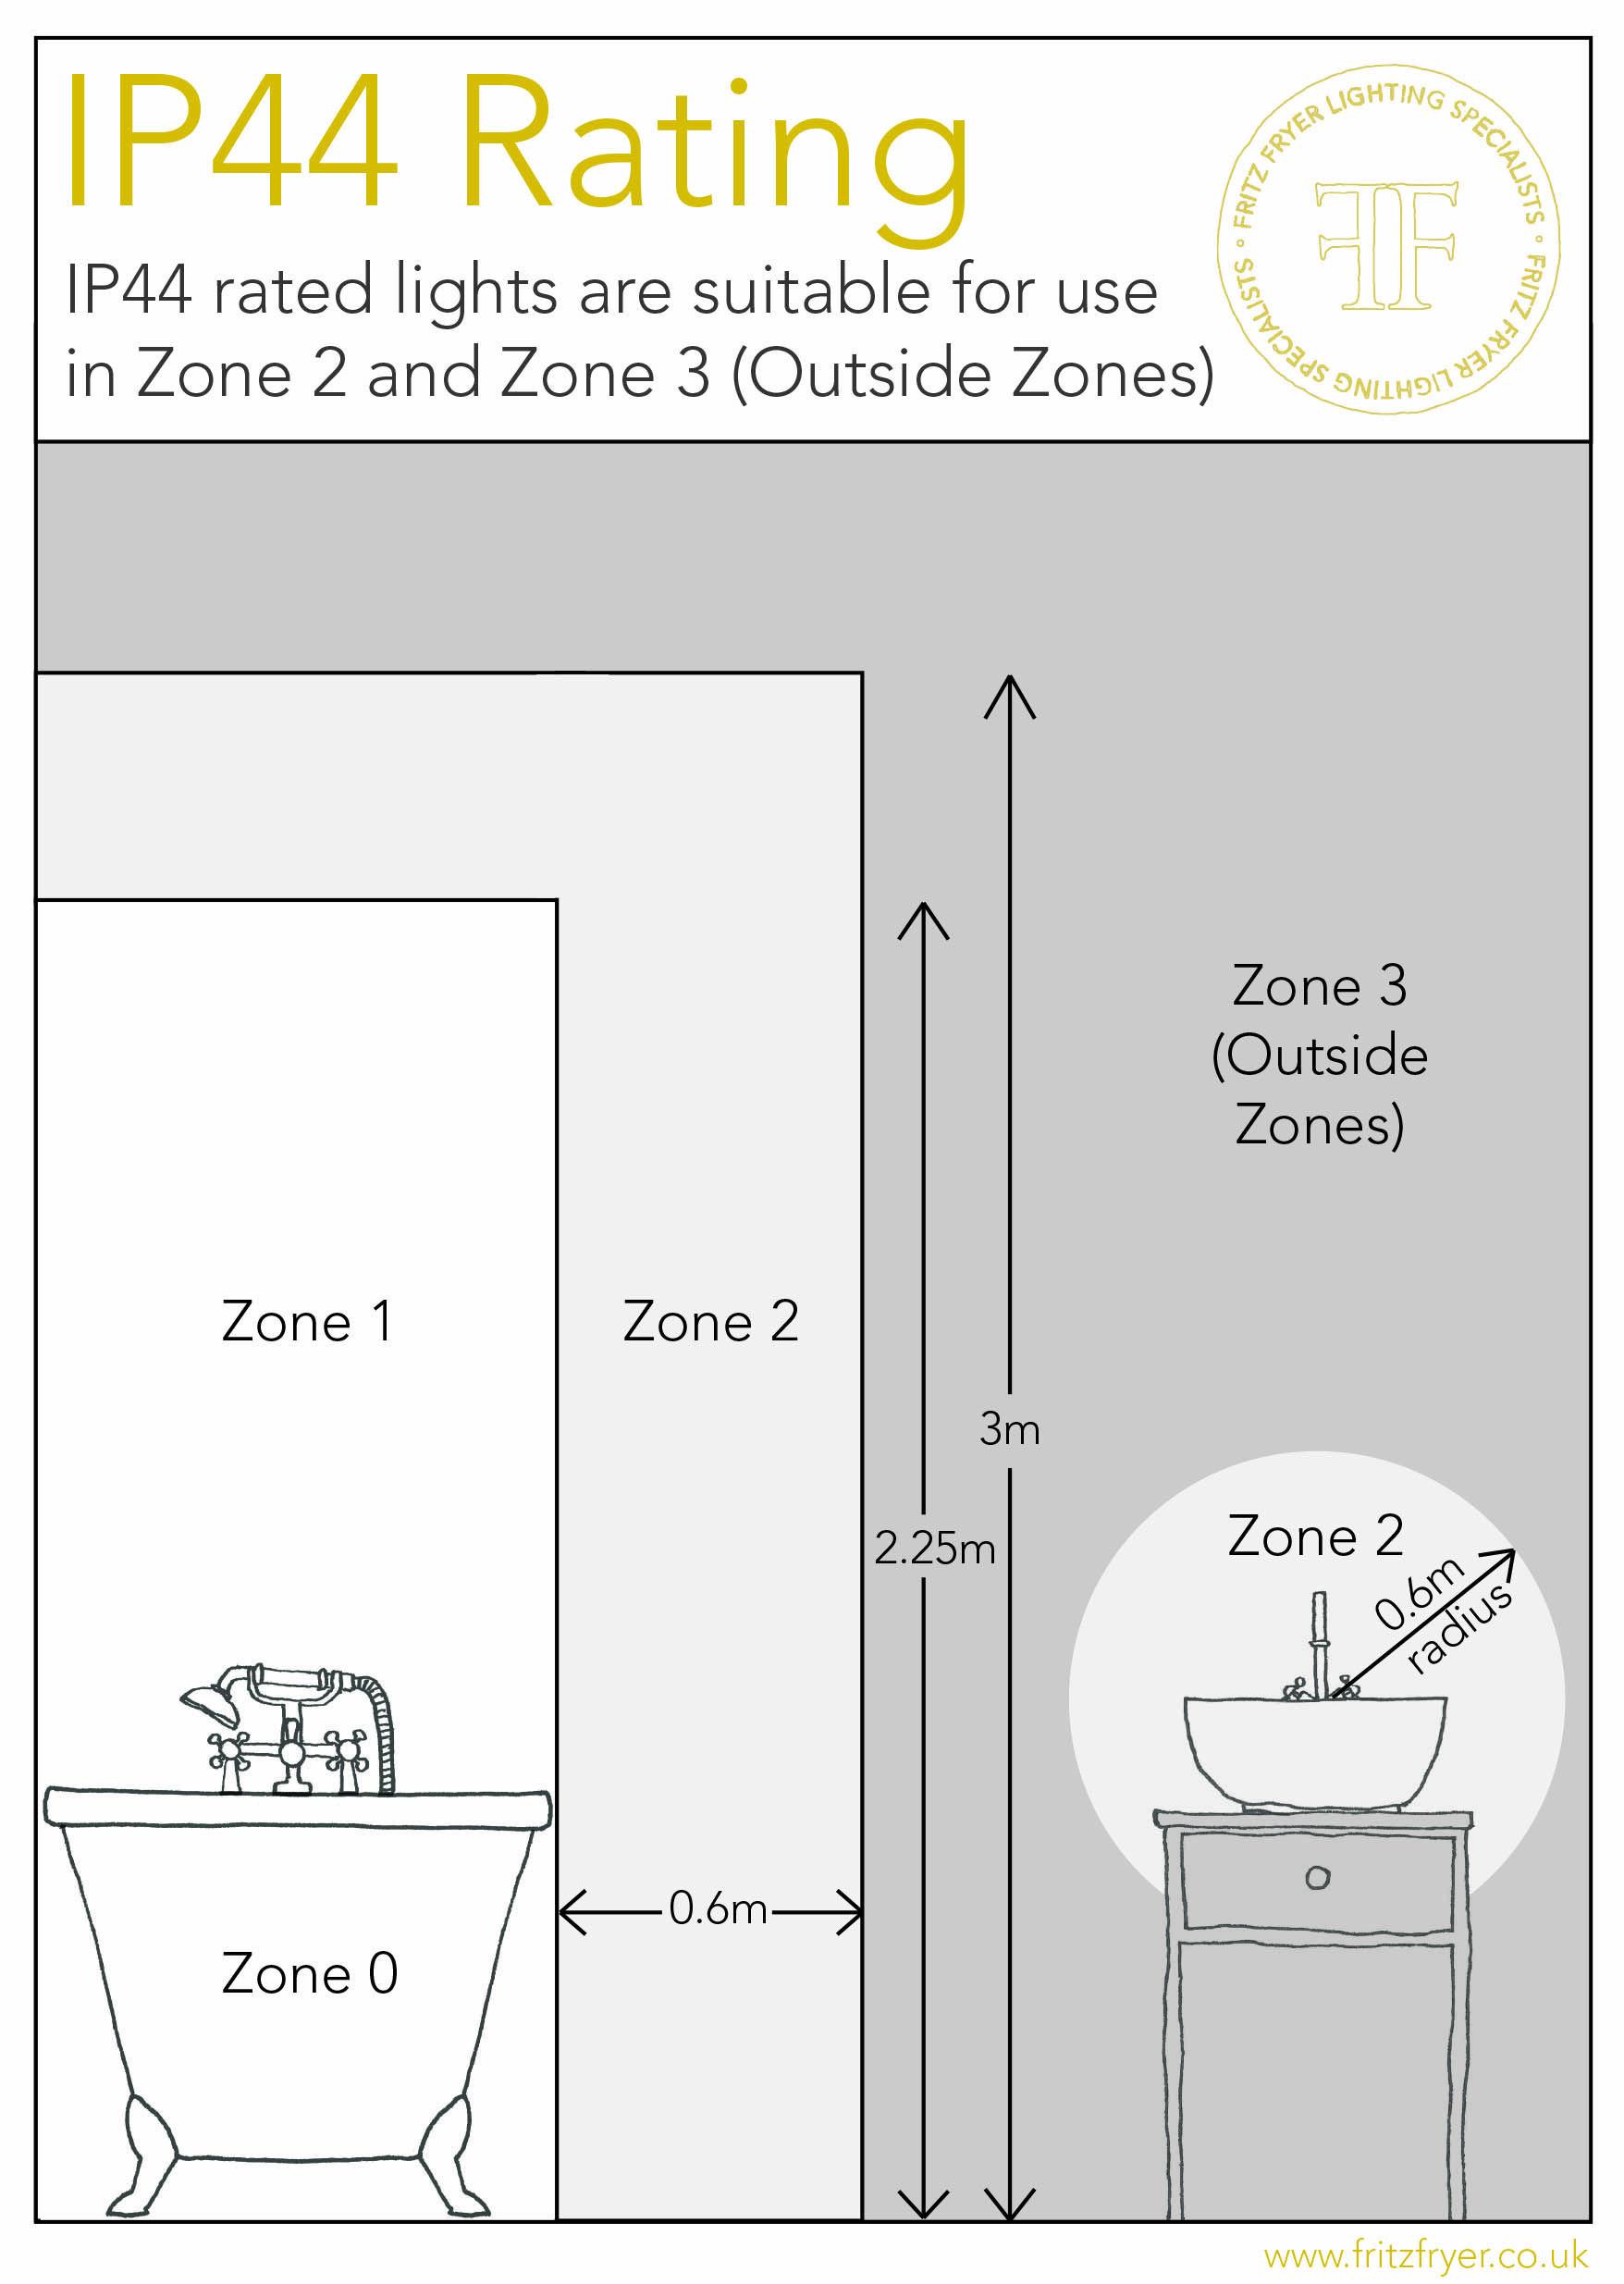 Bathroom Lighting Ip44 Ip44 Bathroom Lighting Zones Explained Bathroom Lighting Ip Bathroom Lighting Bathroom Wall Lights Contemporary Bathroom Lighting